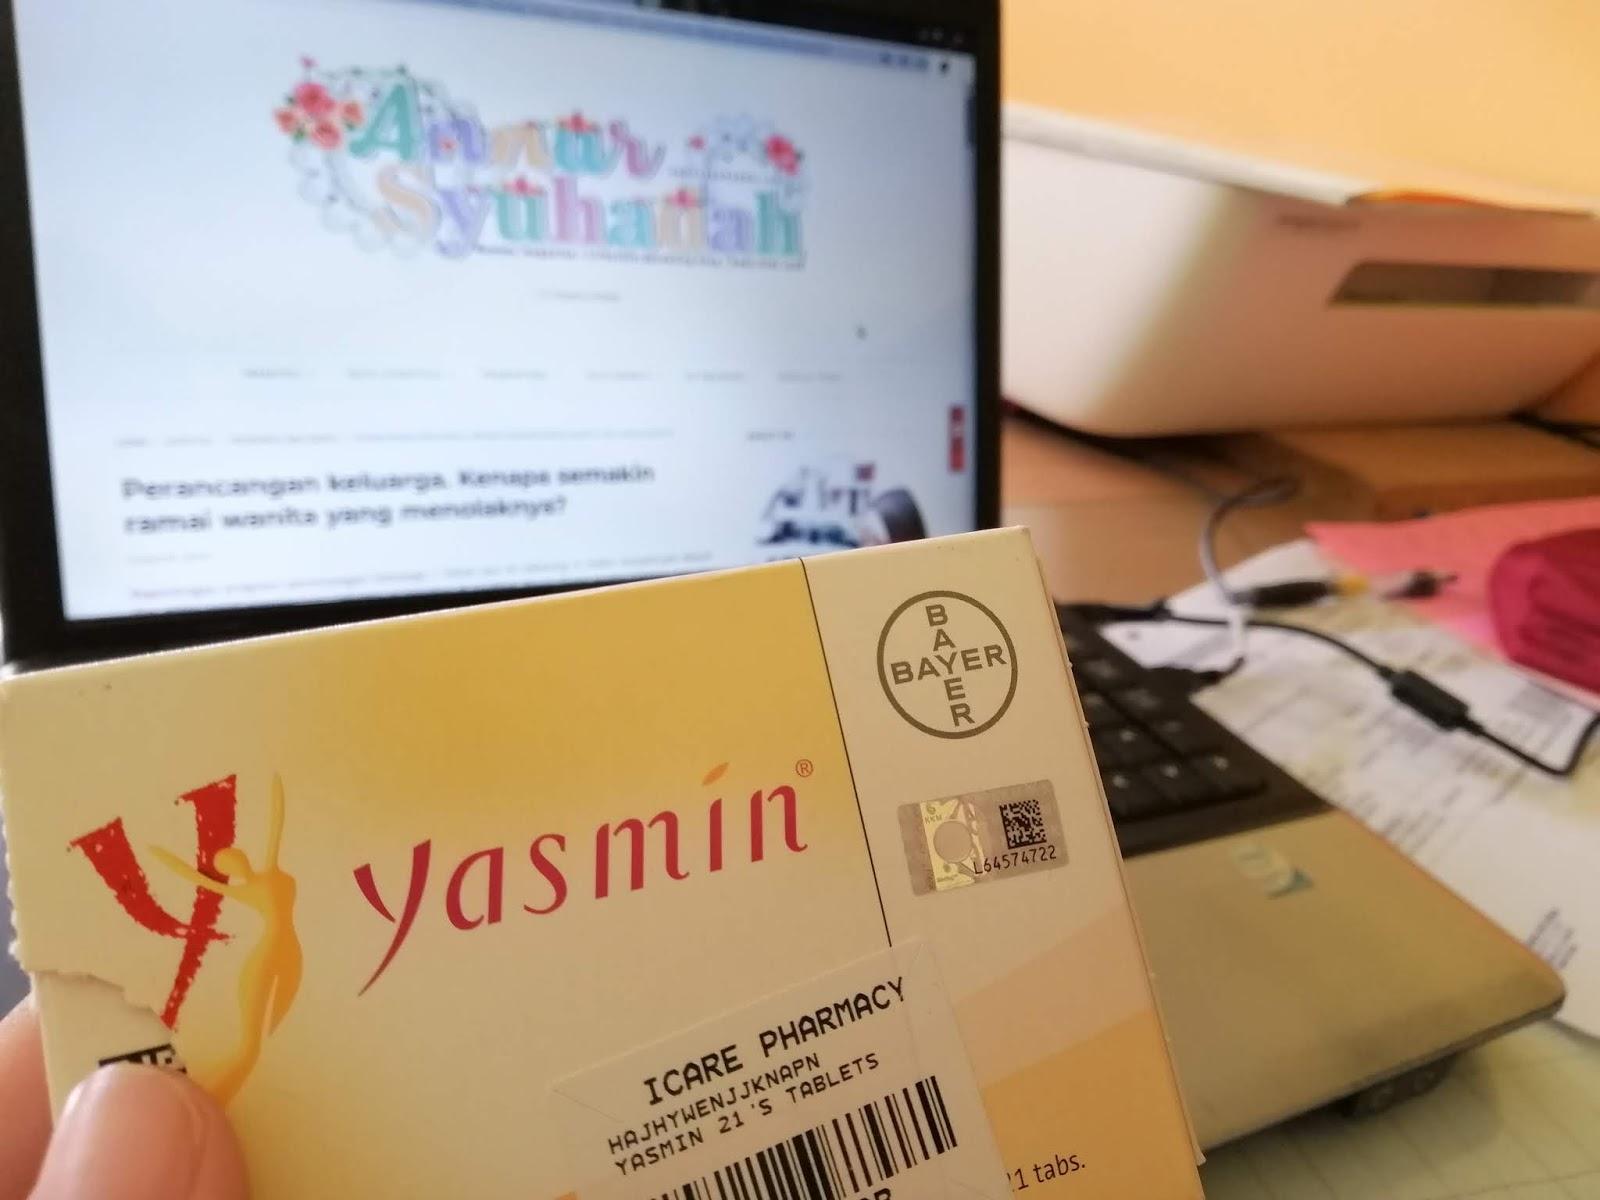 Review Pil Perancang Yasmin (Drospirenone, ethinylestradiol), macam mana cara makan pil yasmin? elok ke pil yasmin, cara ambil pil norriday, ubat perancang untuk ibu menyusu